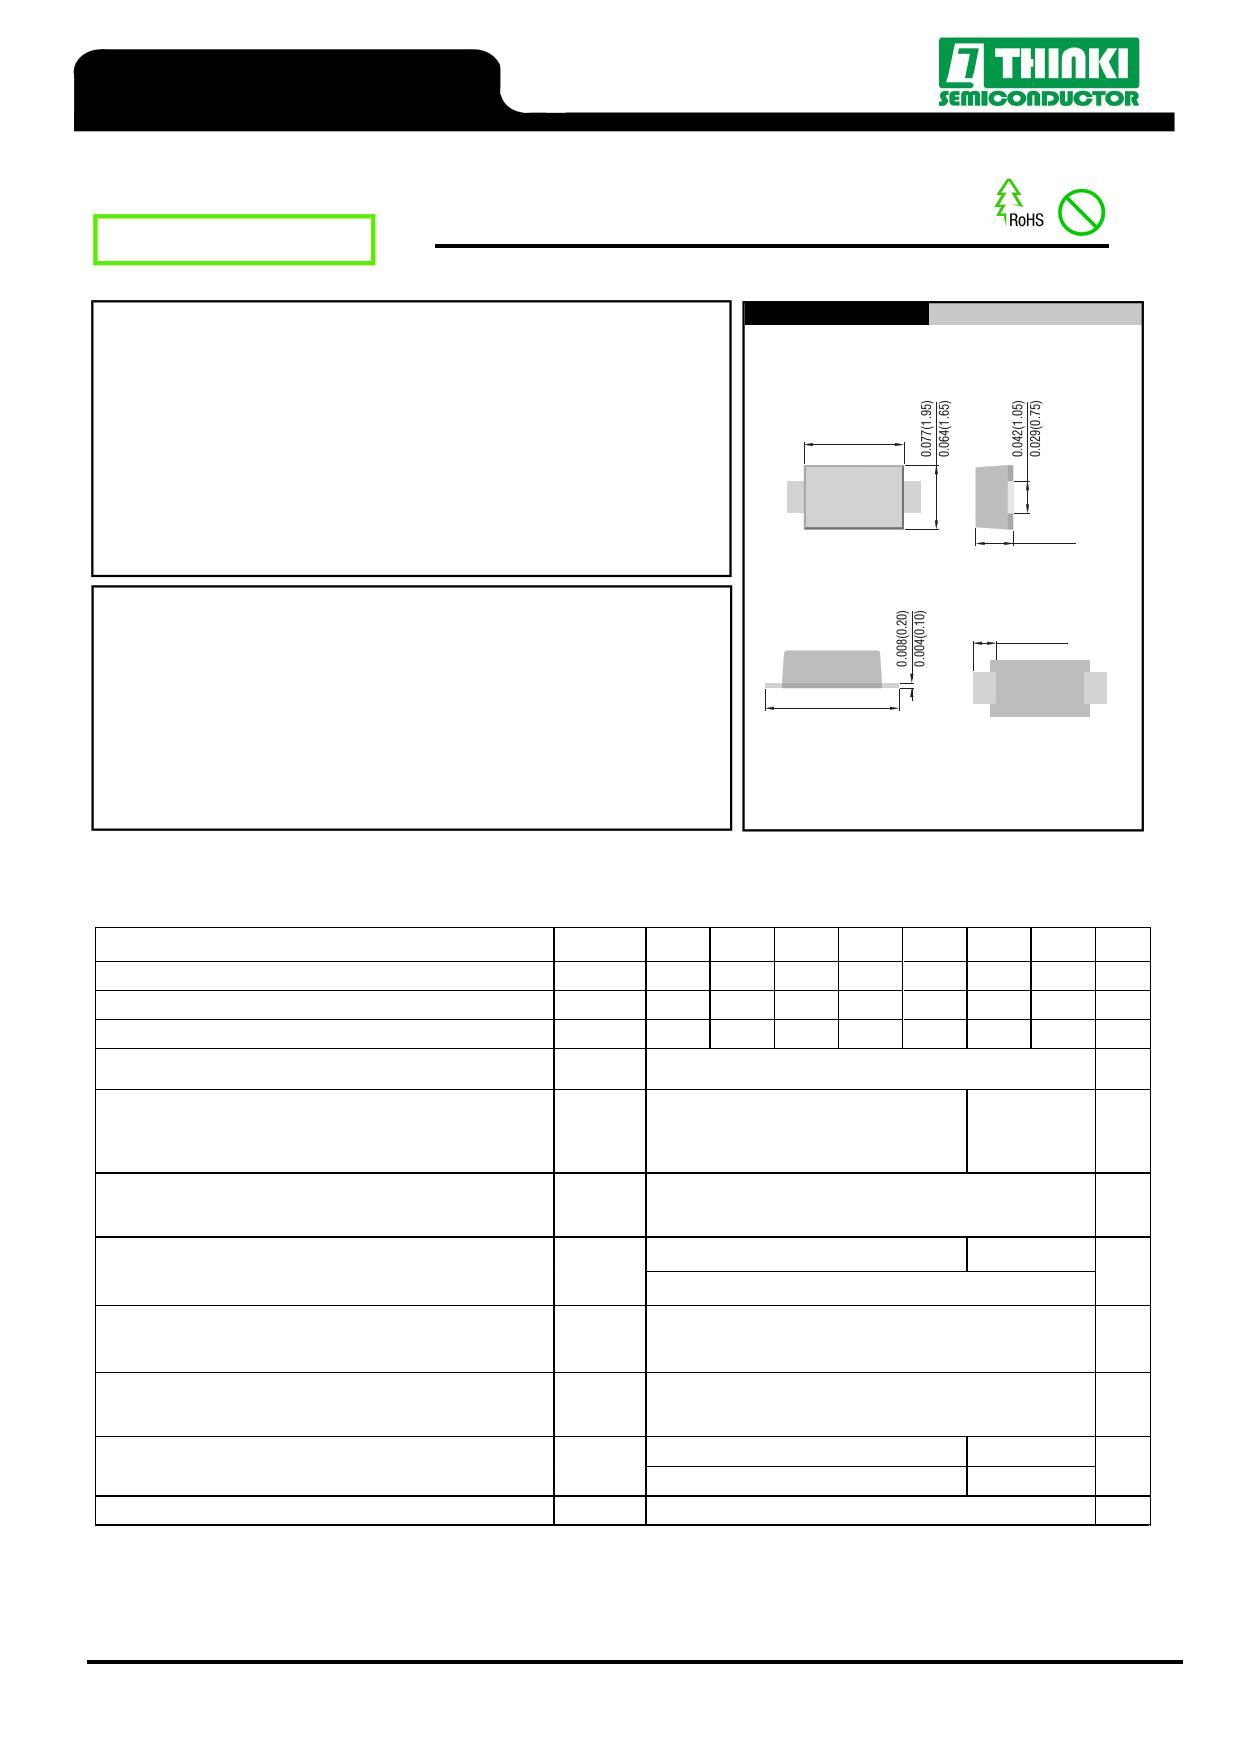 SM4005PL datasheet